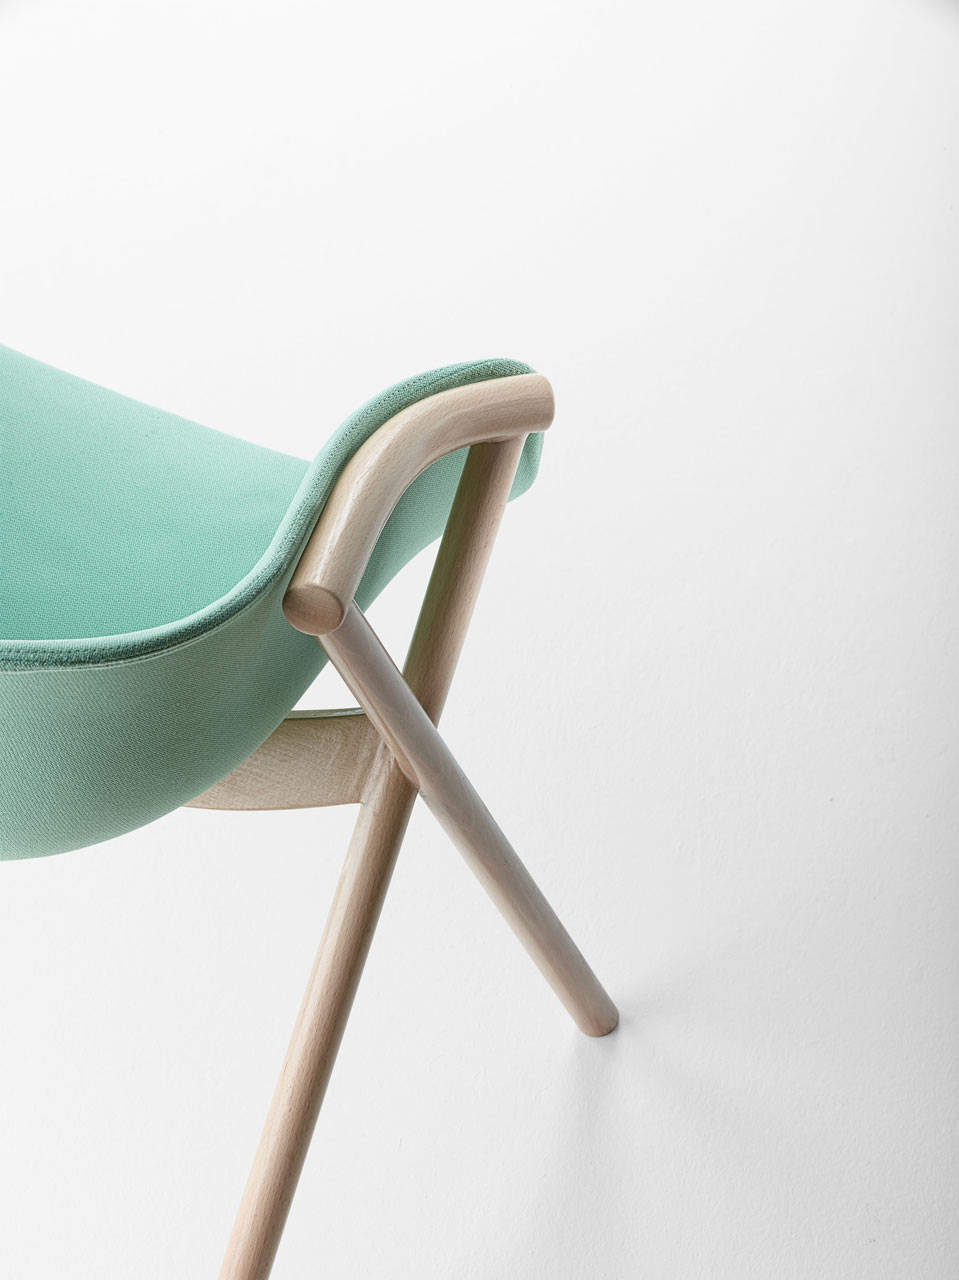 Bai-Chair-Ondarreta-Ander-Lizaso-5